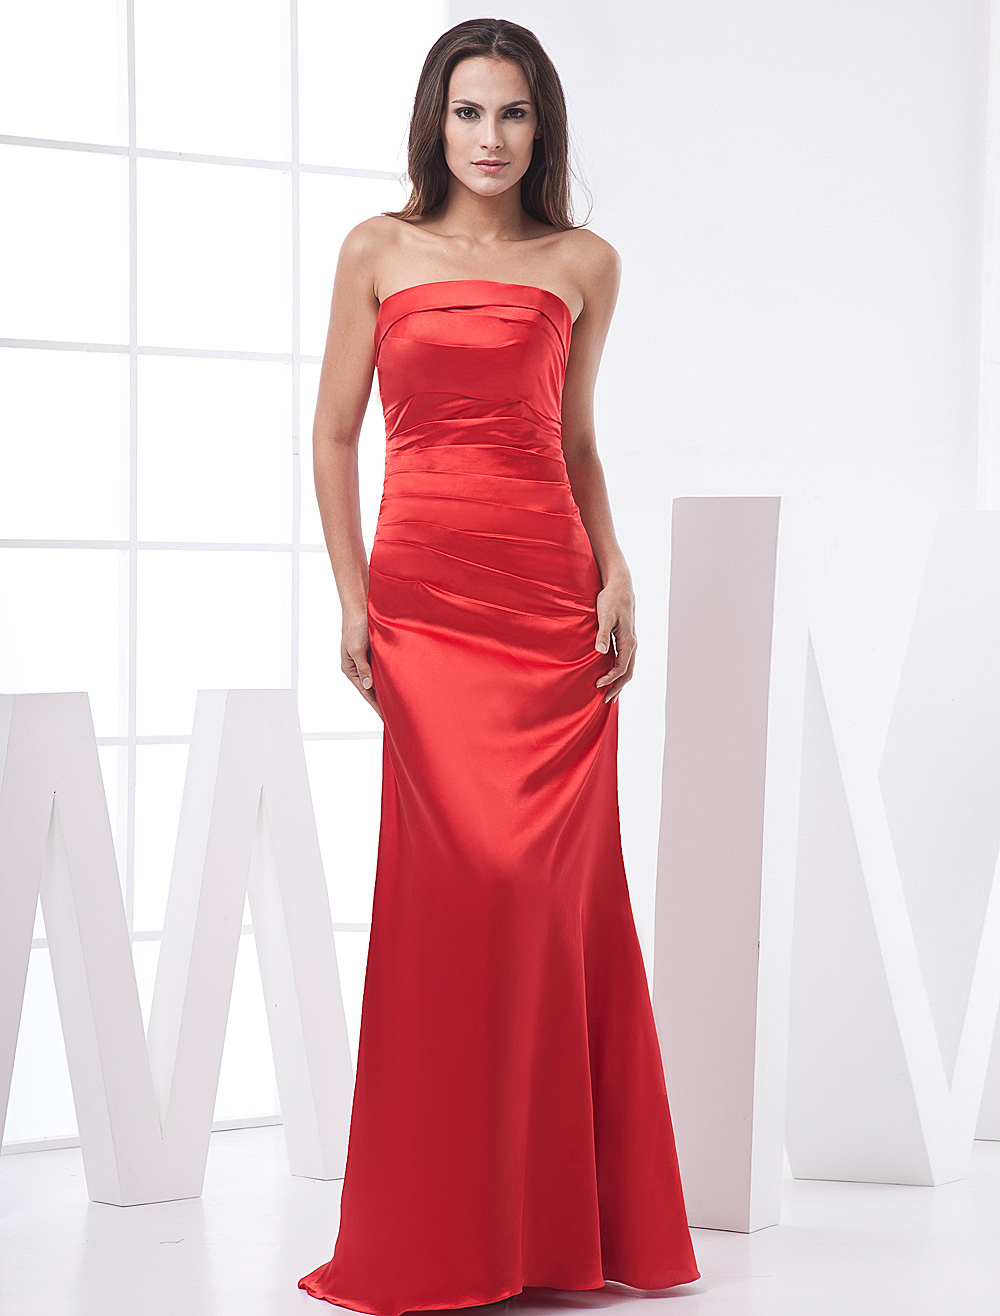 Red Strapless Satin Prom Dress - Milanoo.com